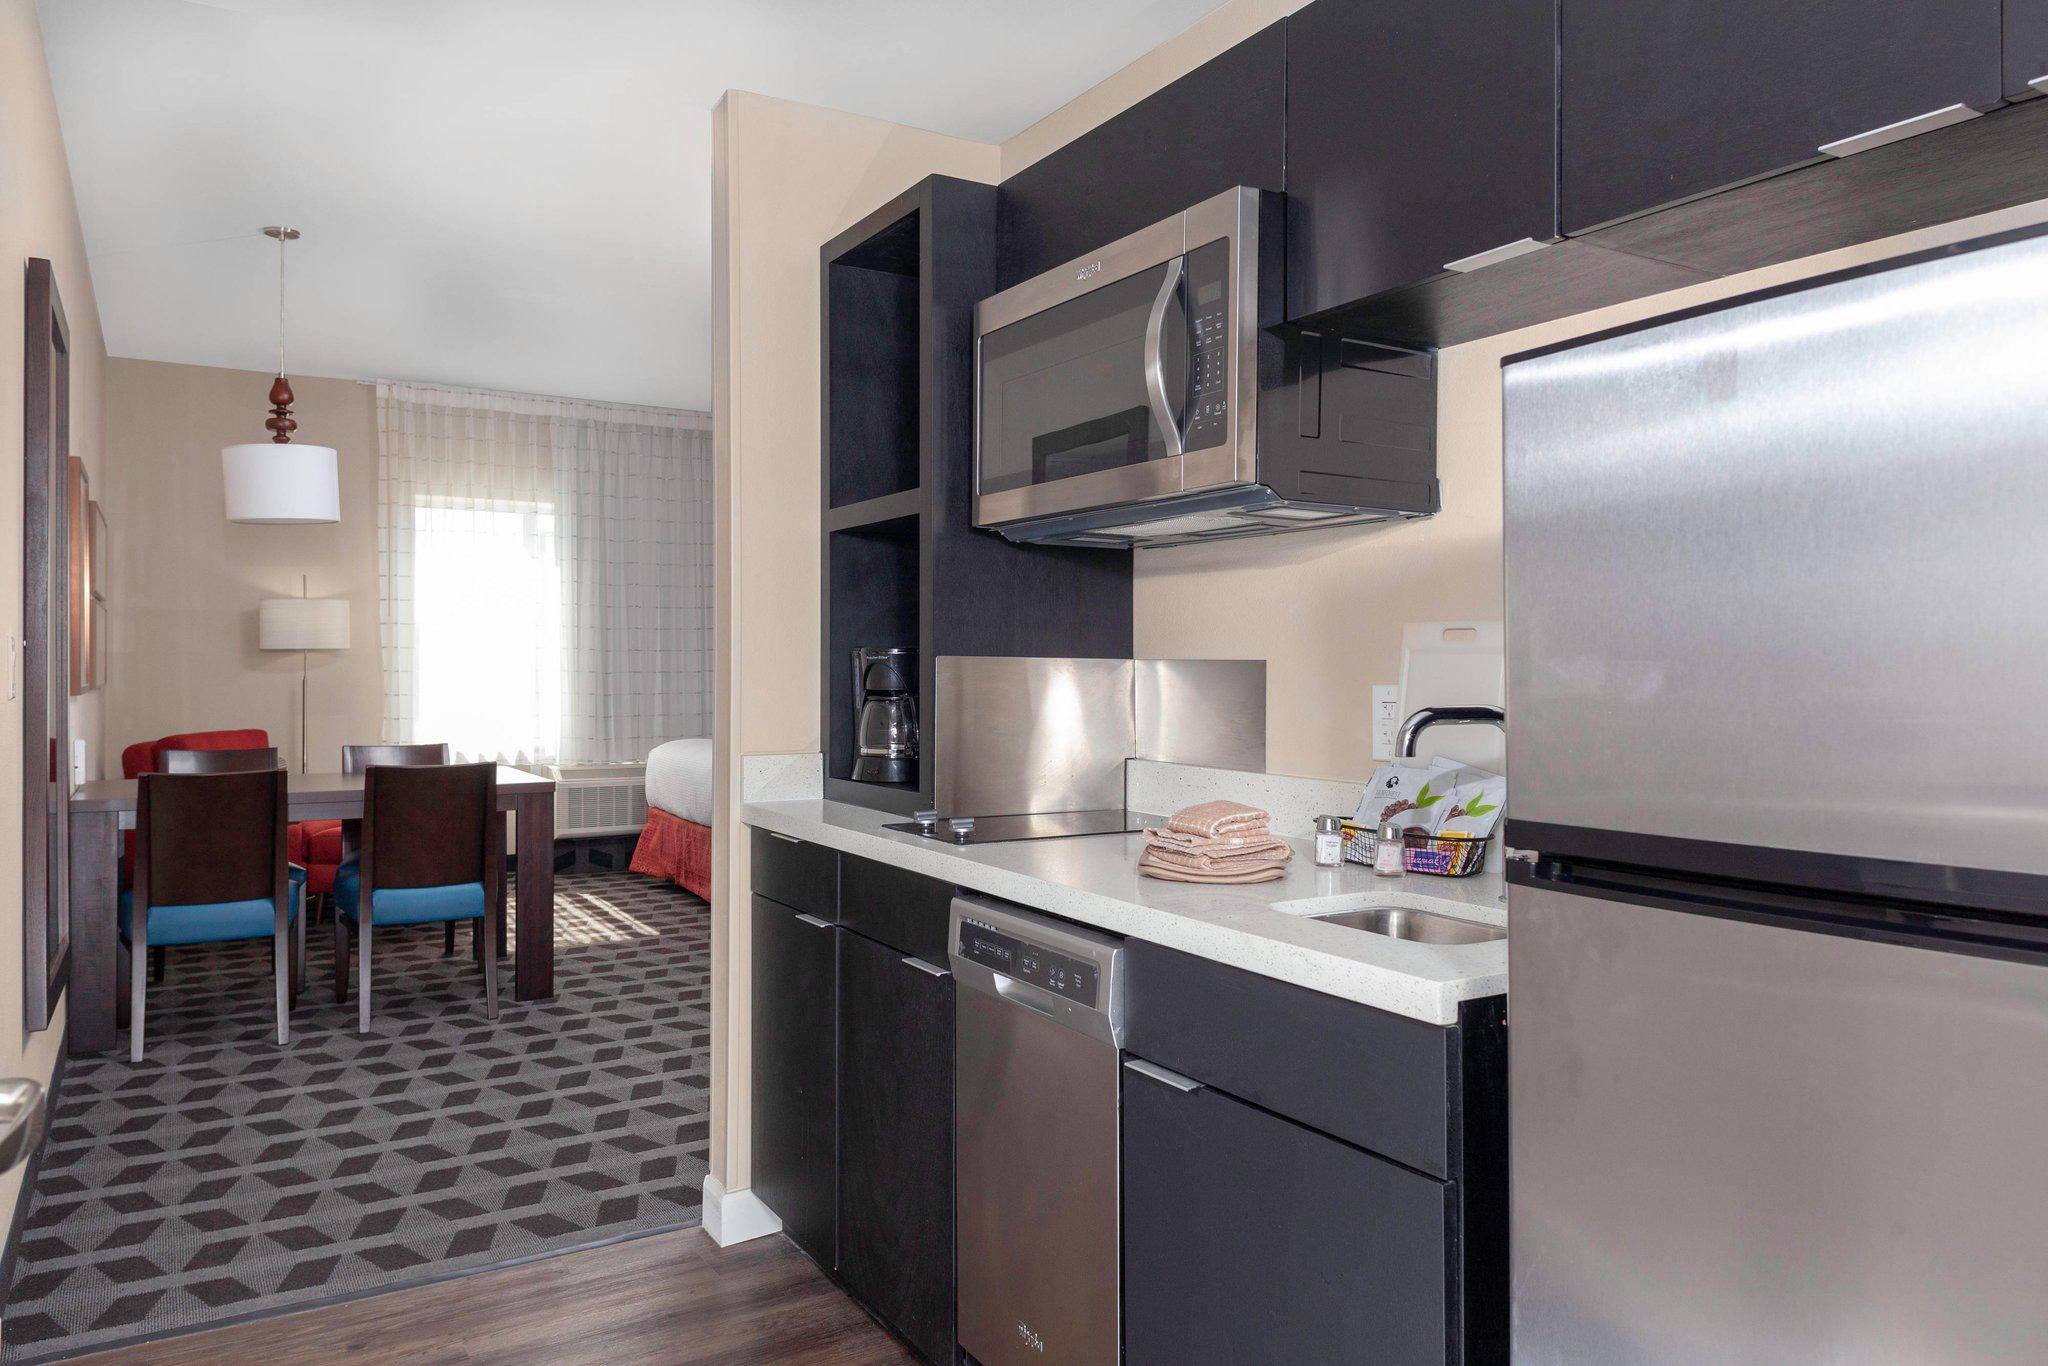 TownePlace Suites by Marriott San Antonio Westover Hills